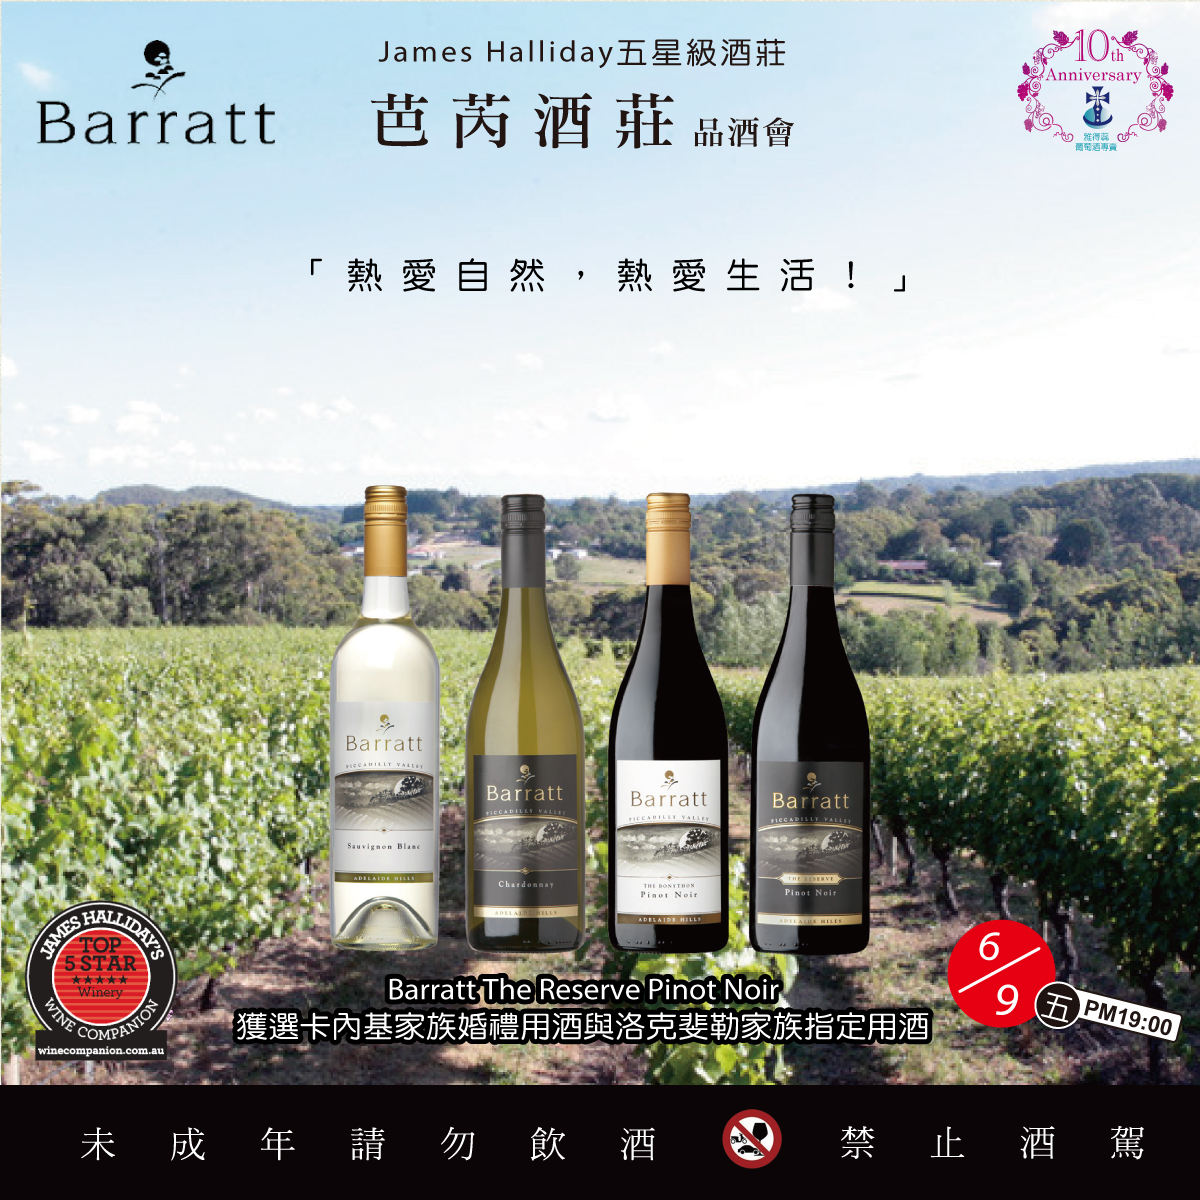 20170609-FB廣告_Barratt-酒-.jpg